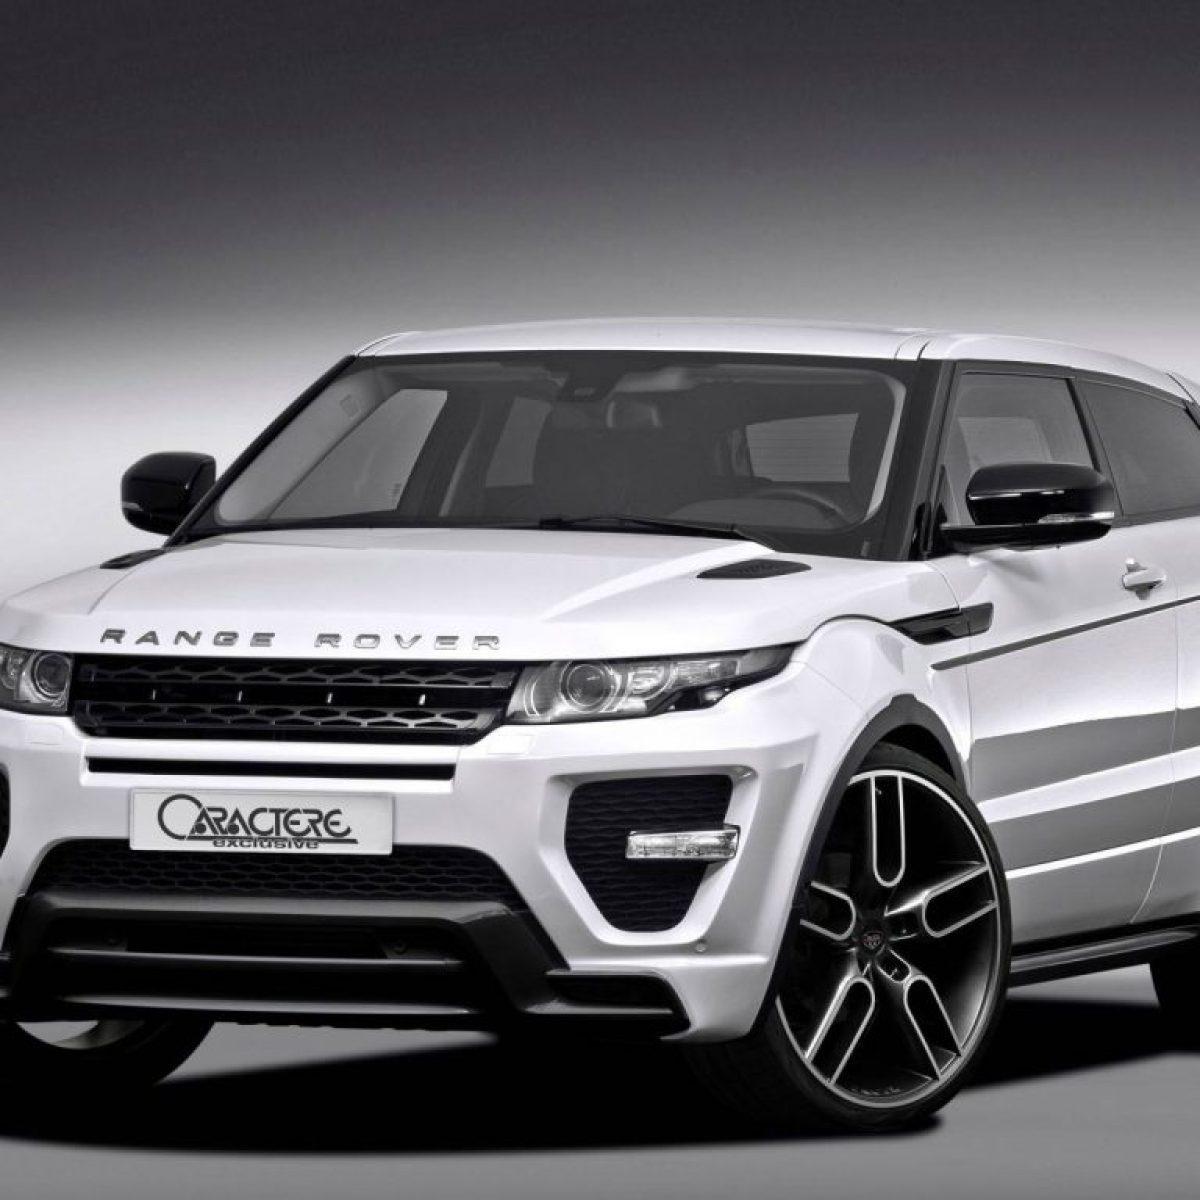 2014 Caractere Range Rover Evoque